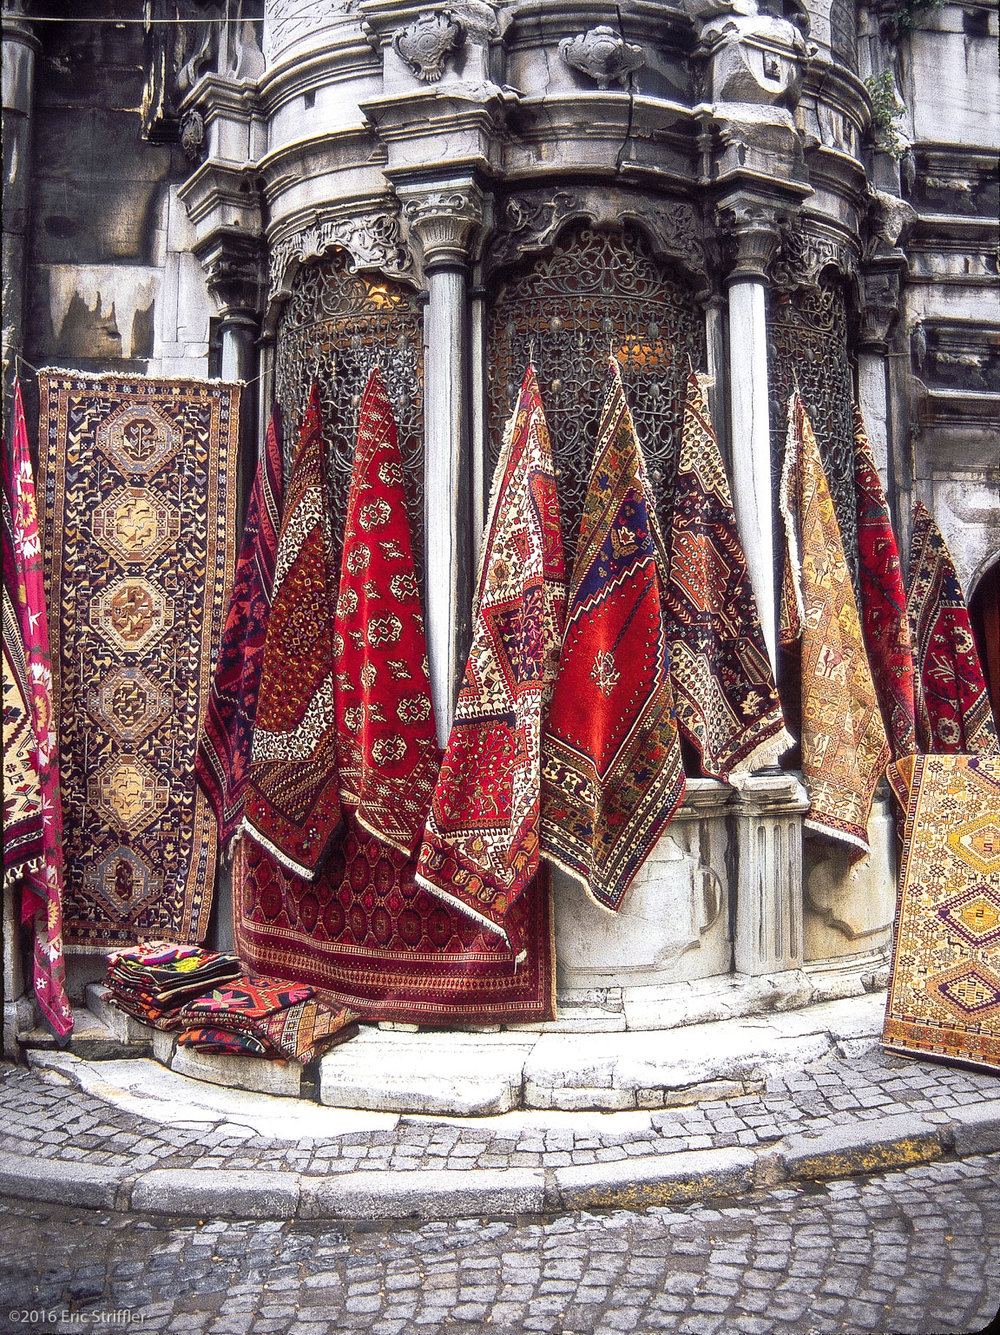 Rugs in Istanbul, Turkey